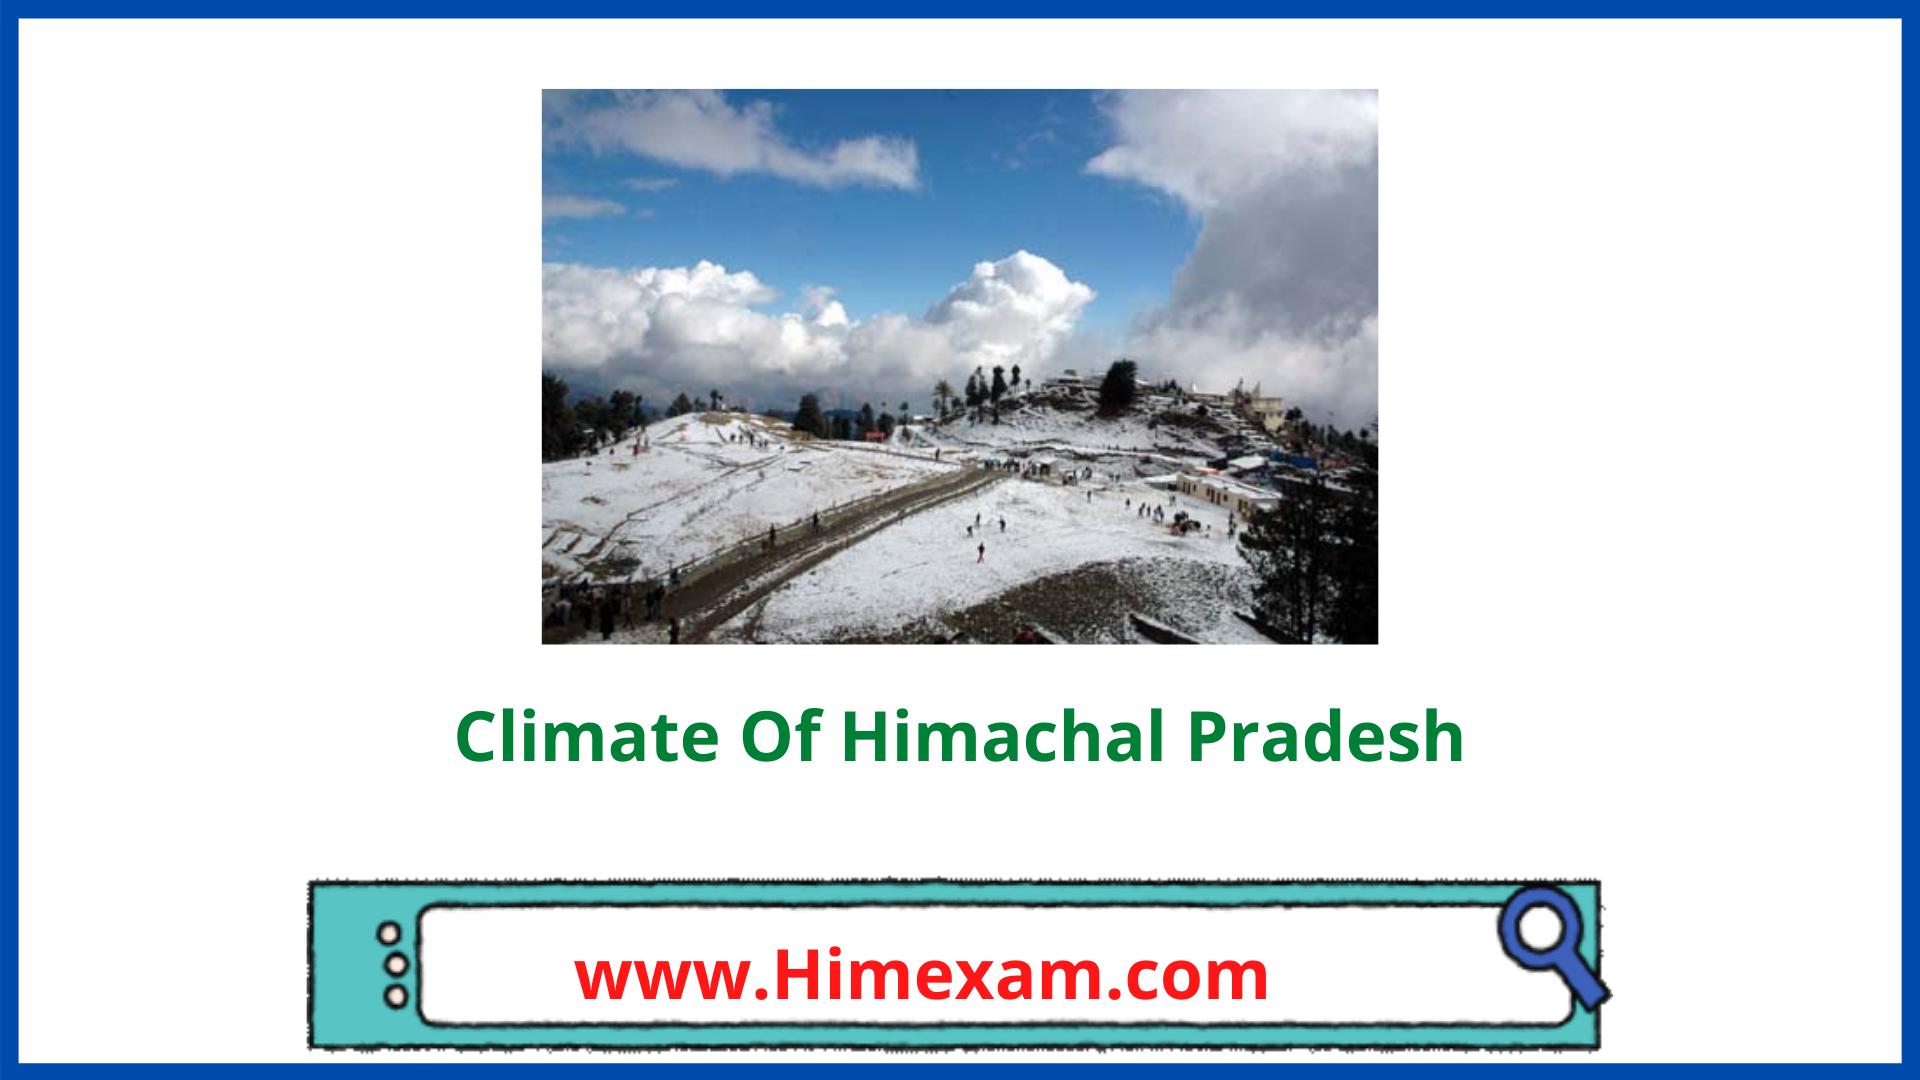 Climate Of Himachal Pradesh